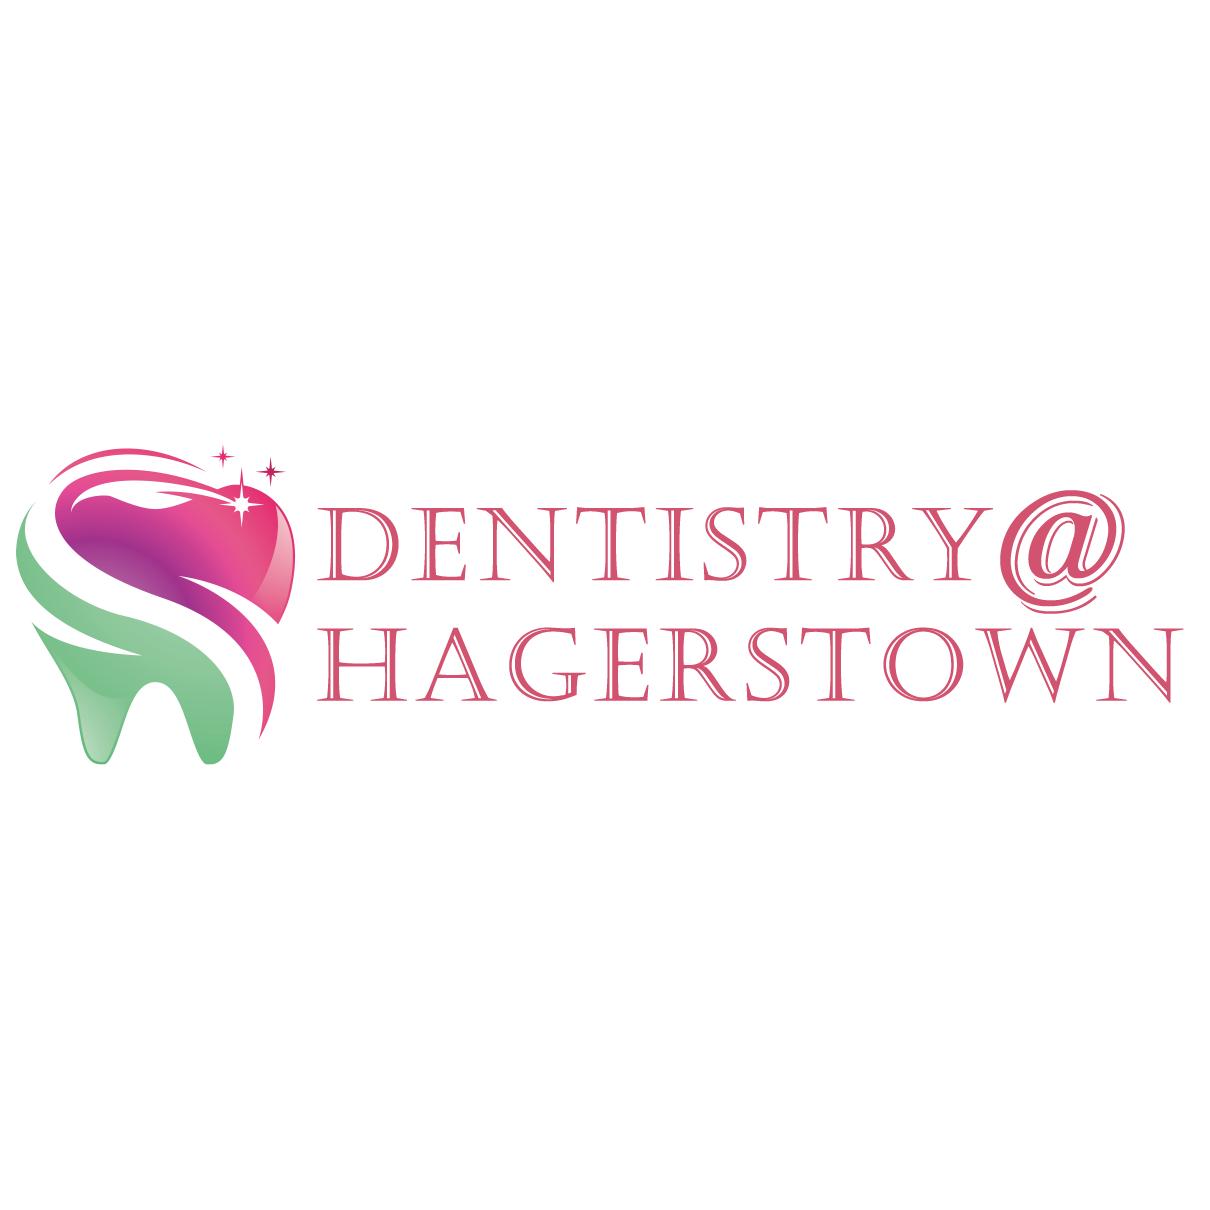 Dentistry @ Hagerstown